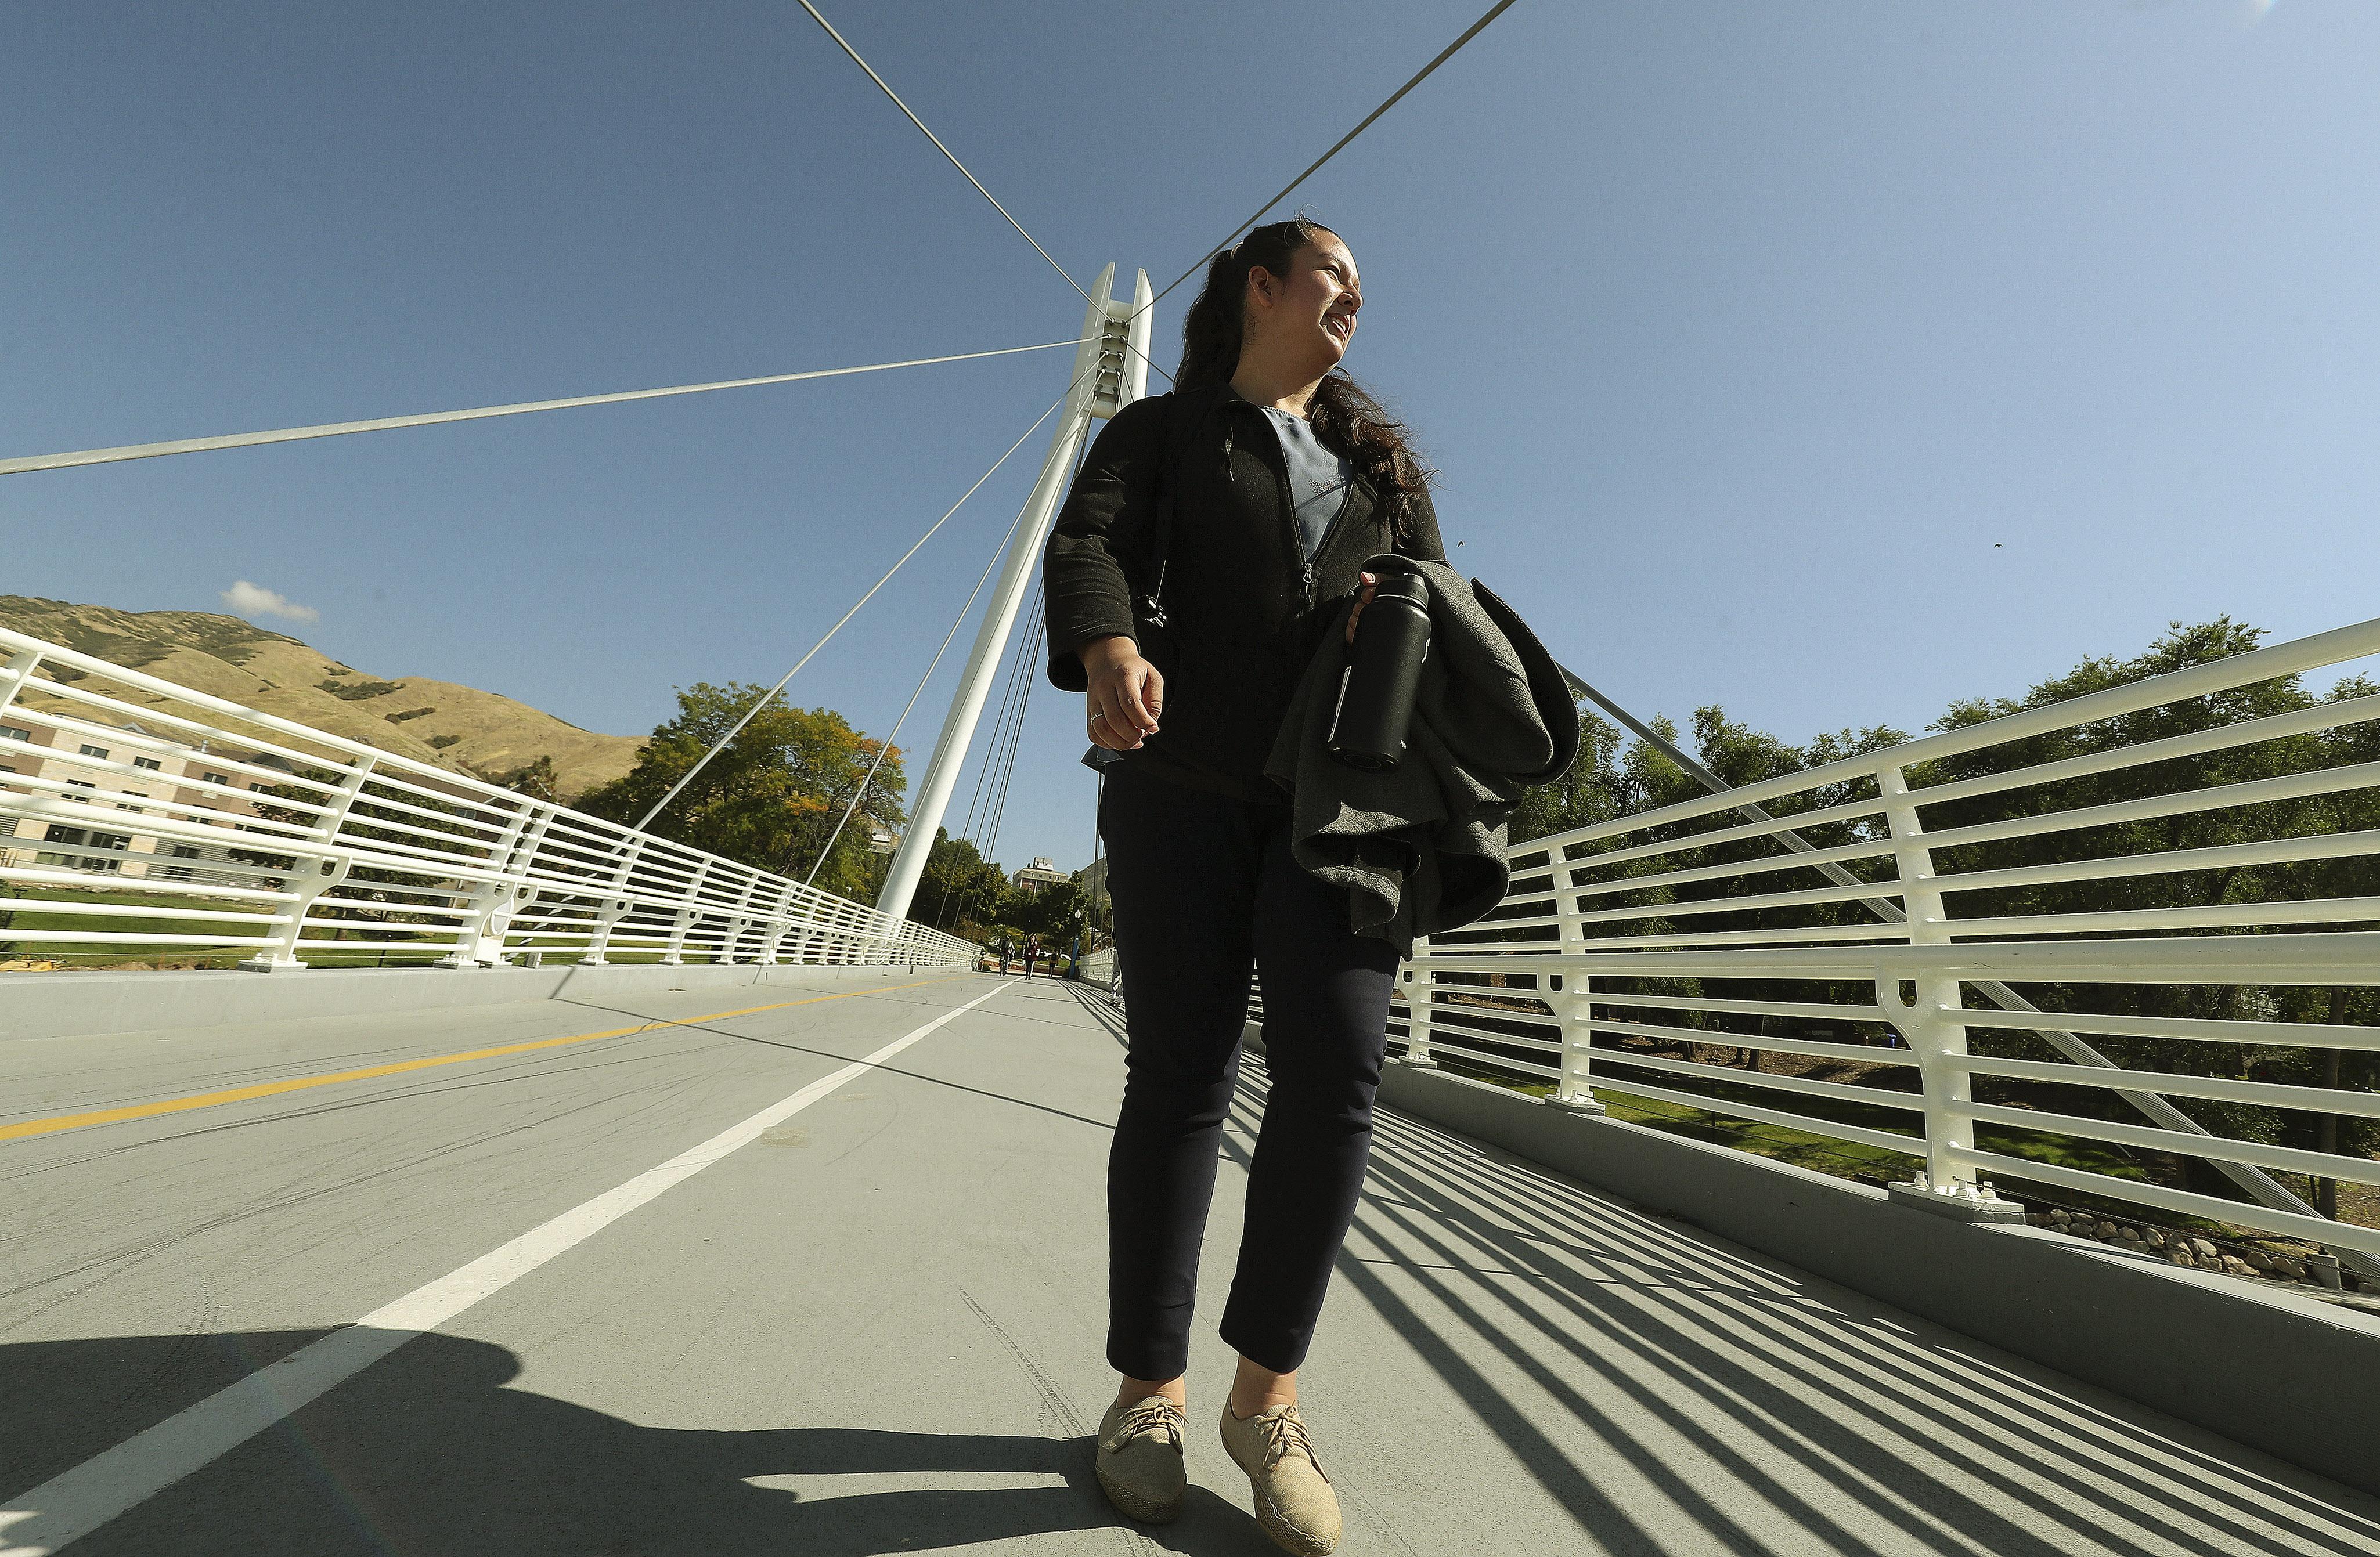 University of Utah student Sinndy Rios walks across the George S. Eccles 2002 Legacy Bridge on campus in Salt Lake City on Tuesday, Oct. 1, 2019.